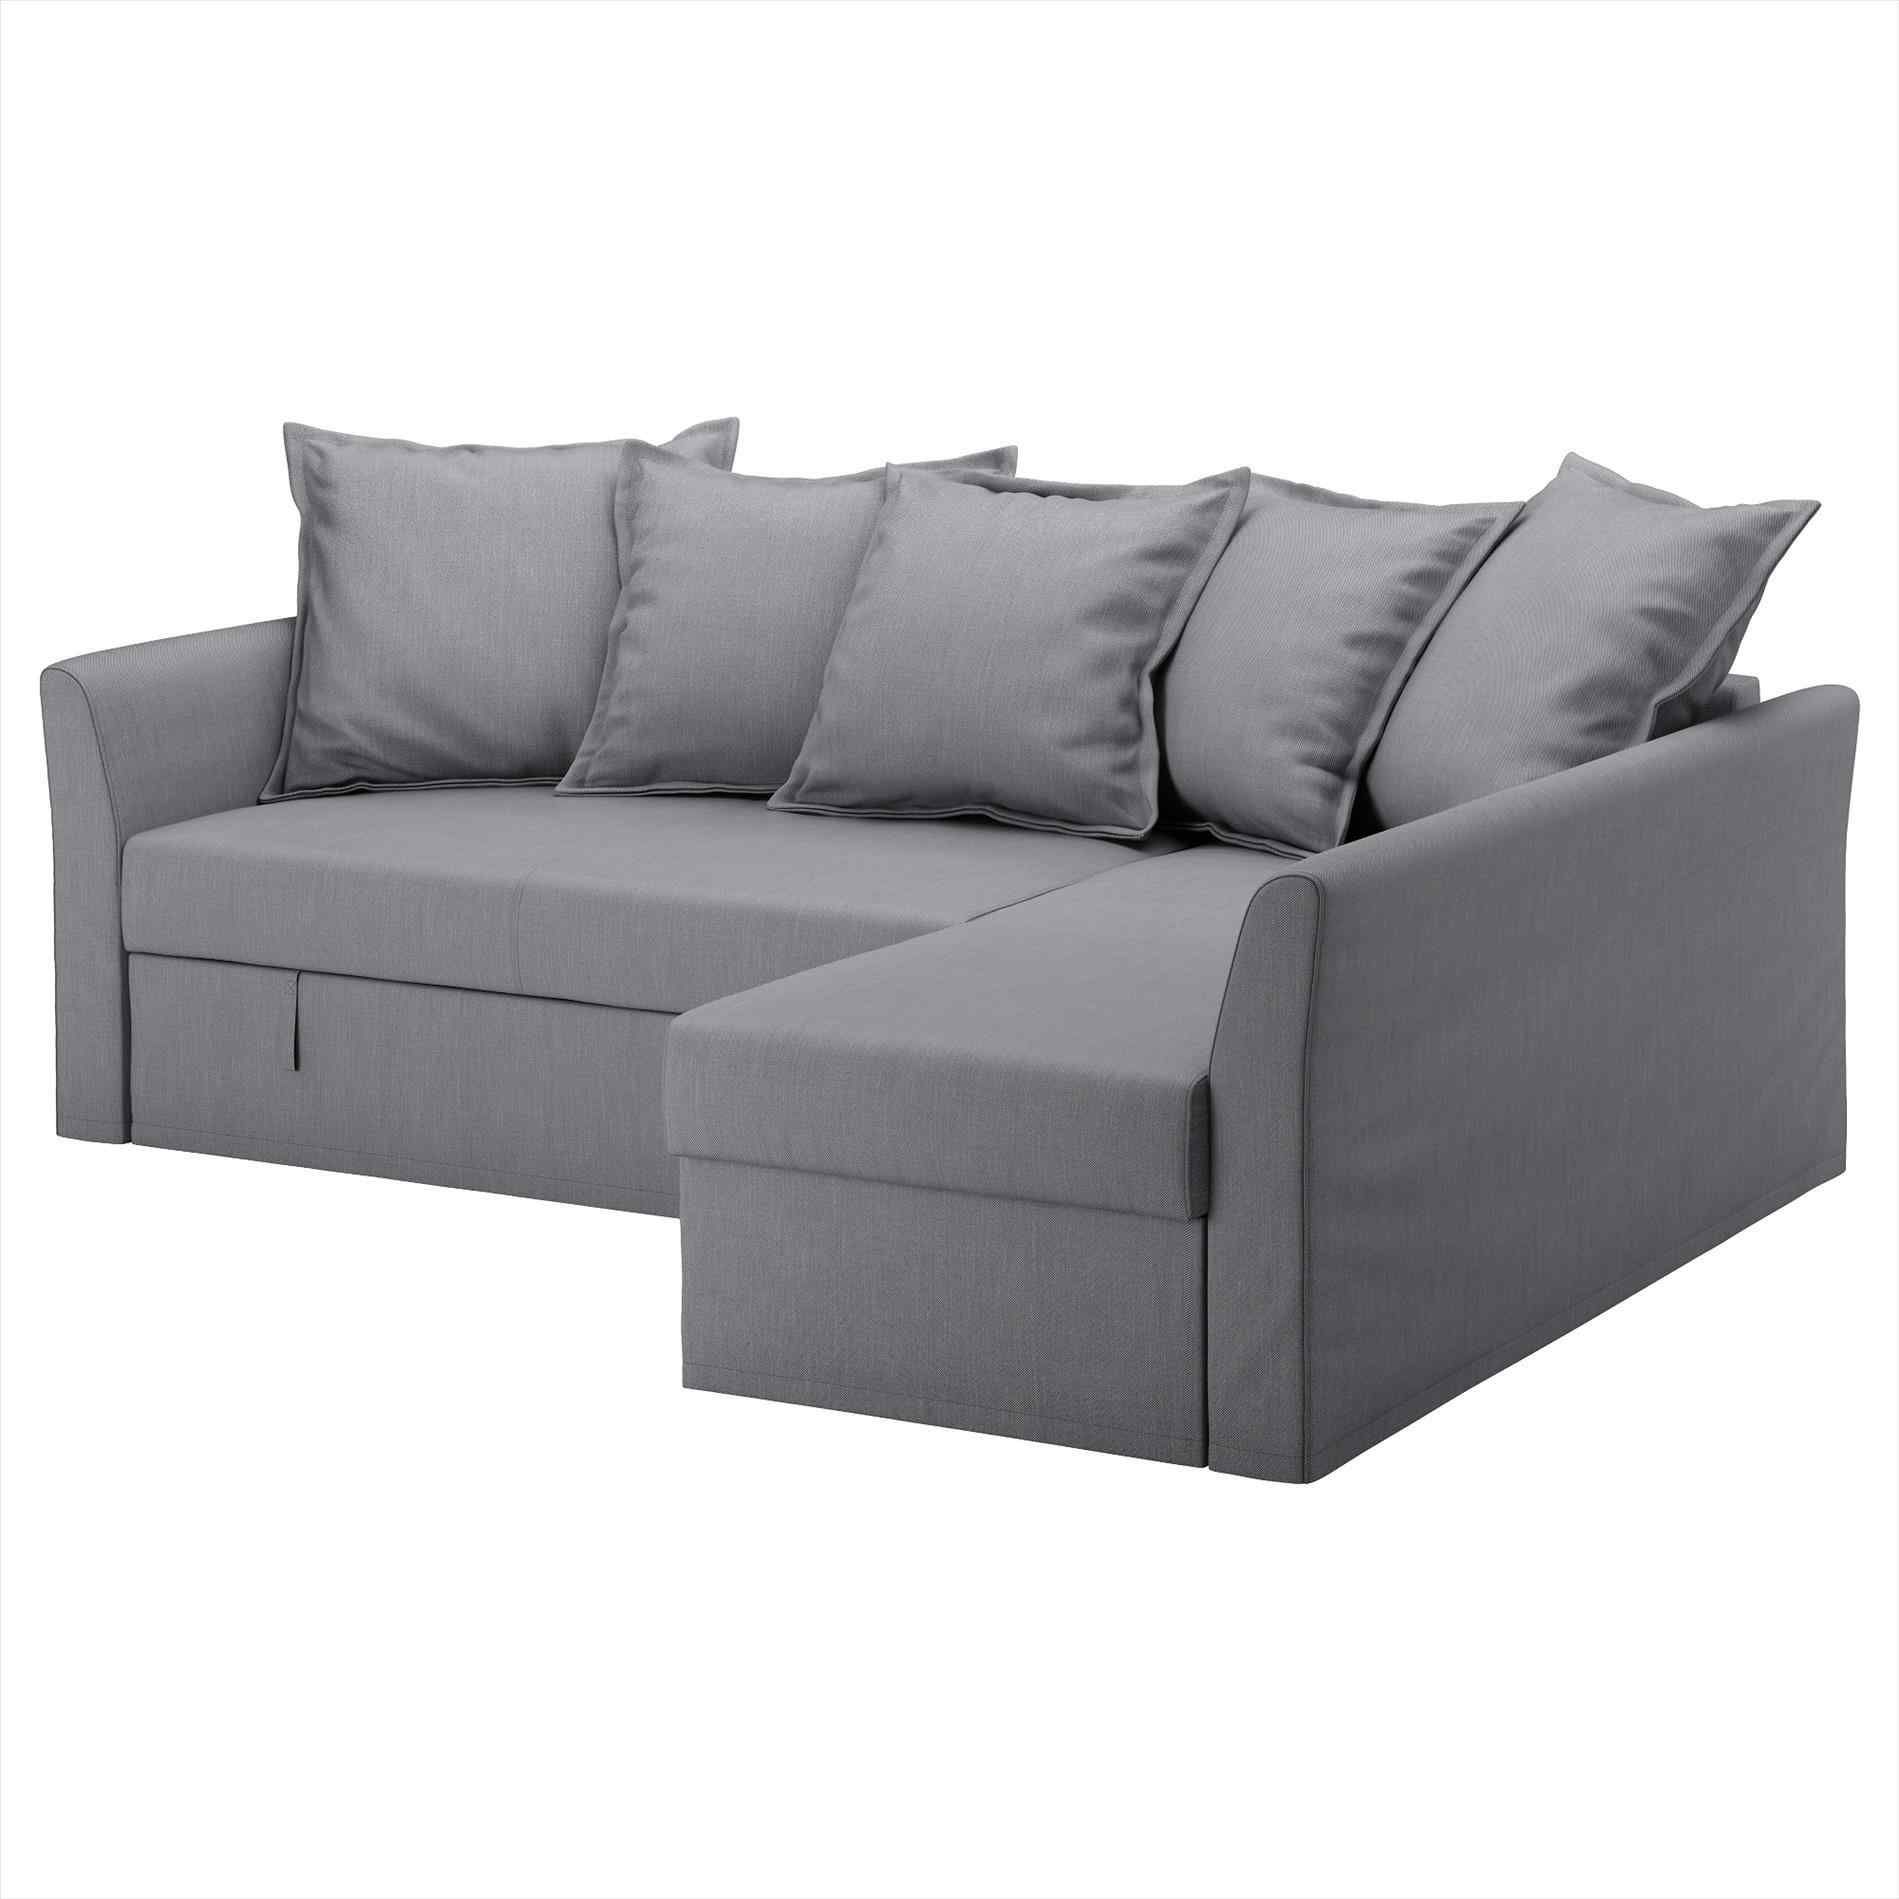 Modern Minimalist Room Decor Sectional S Charming Loveseat Queen Sleeper Sofa Ikea